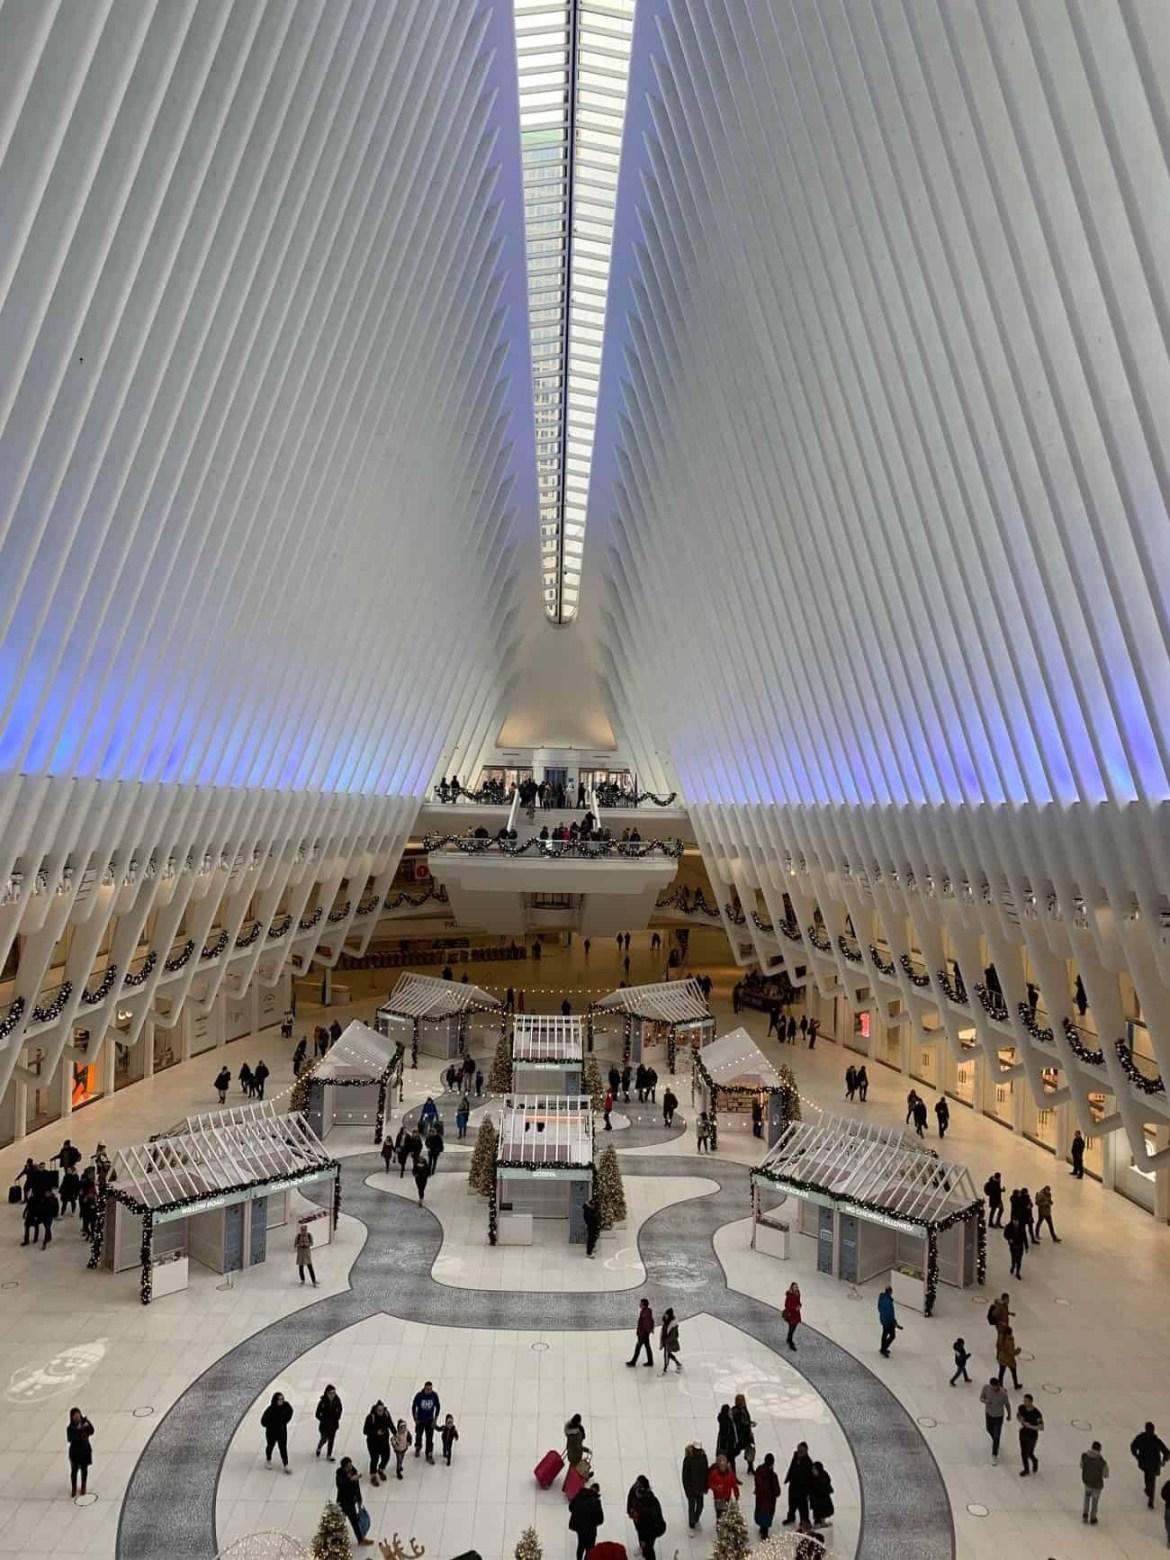 Oculus Transit Hub World Trade Centre